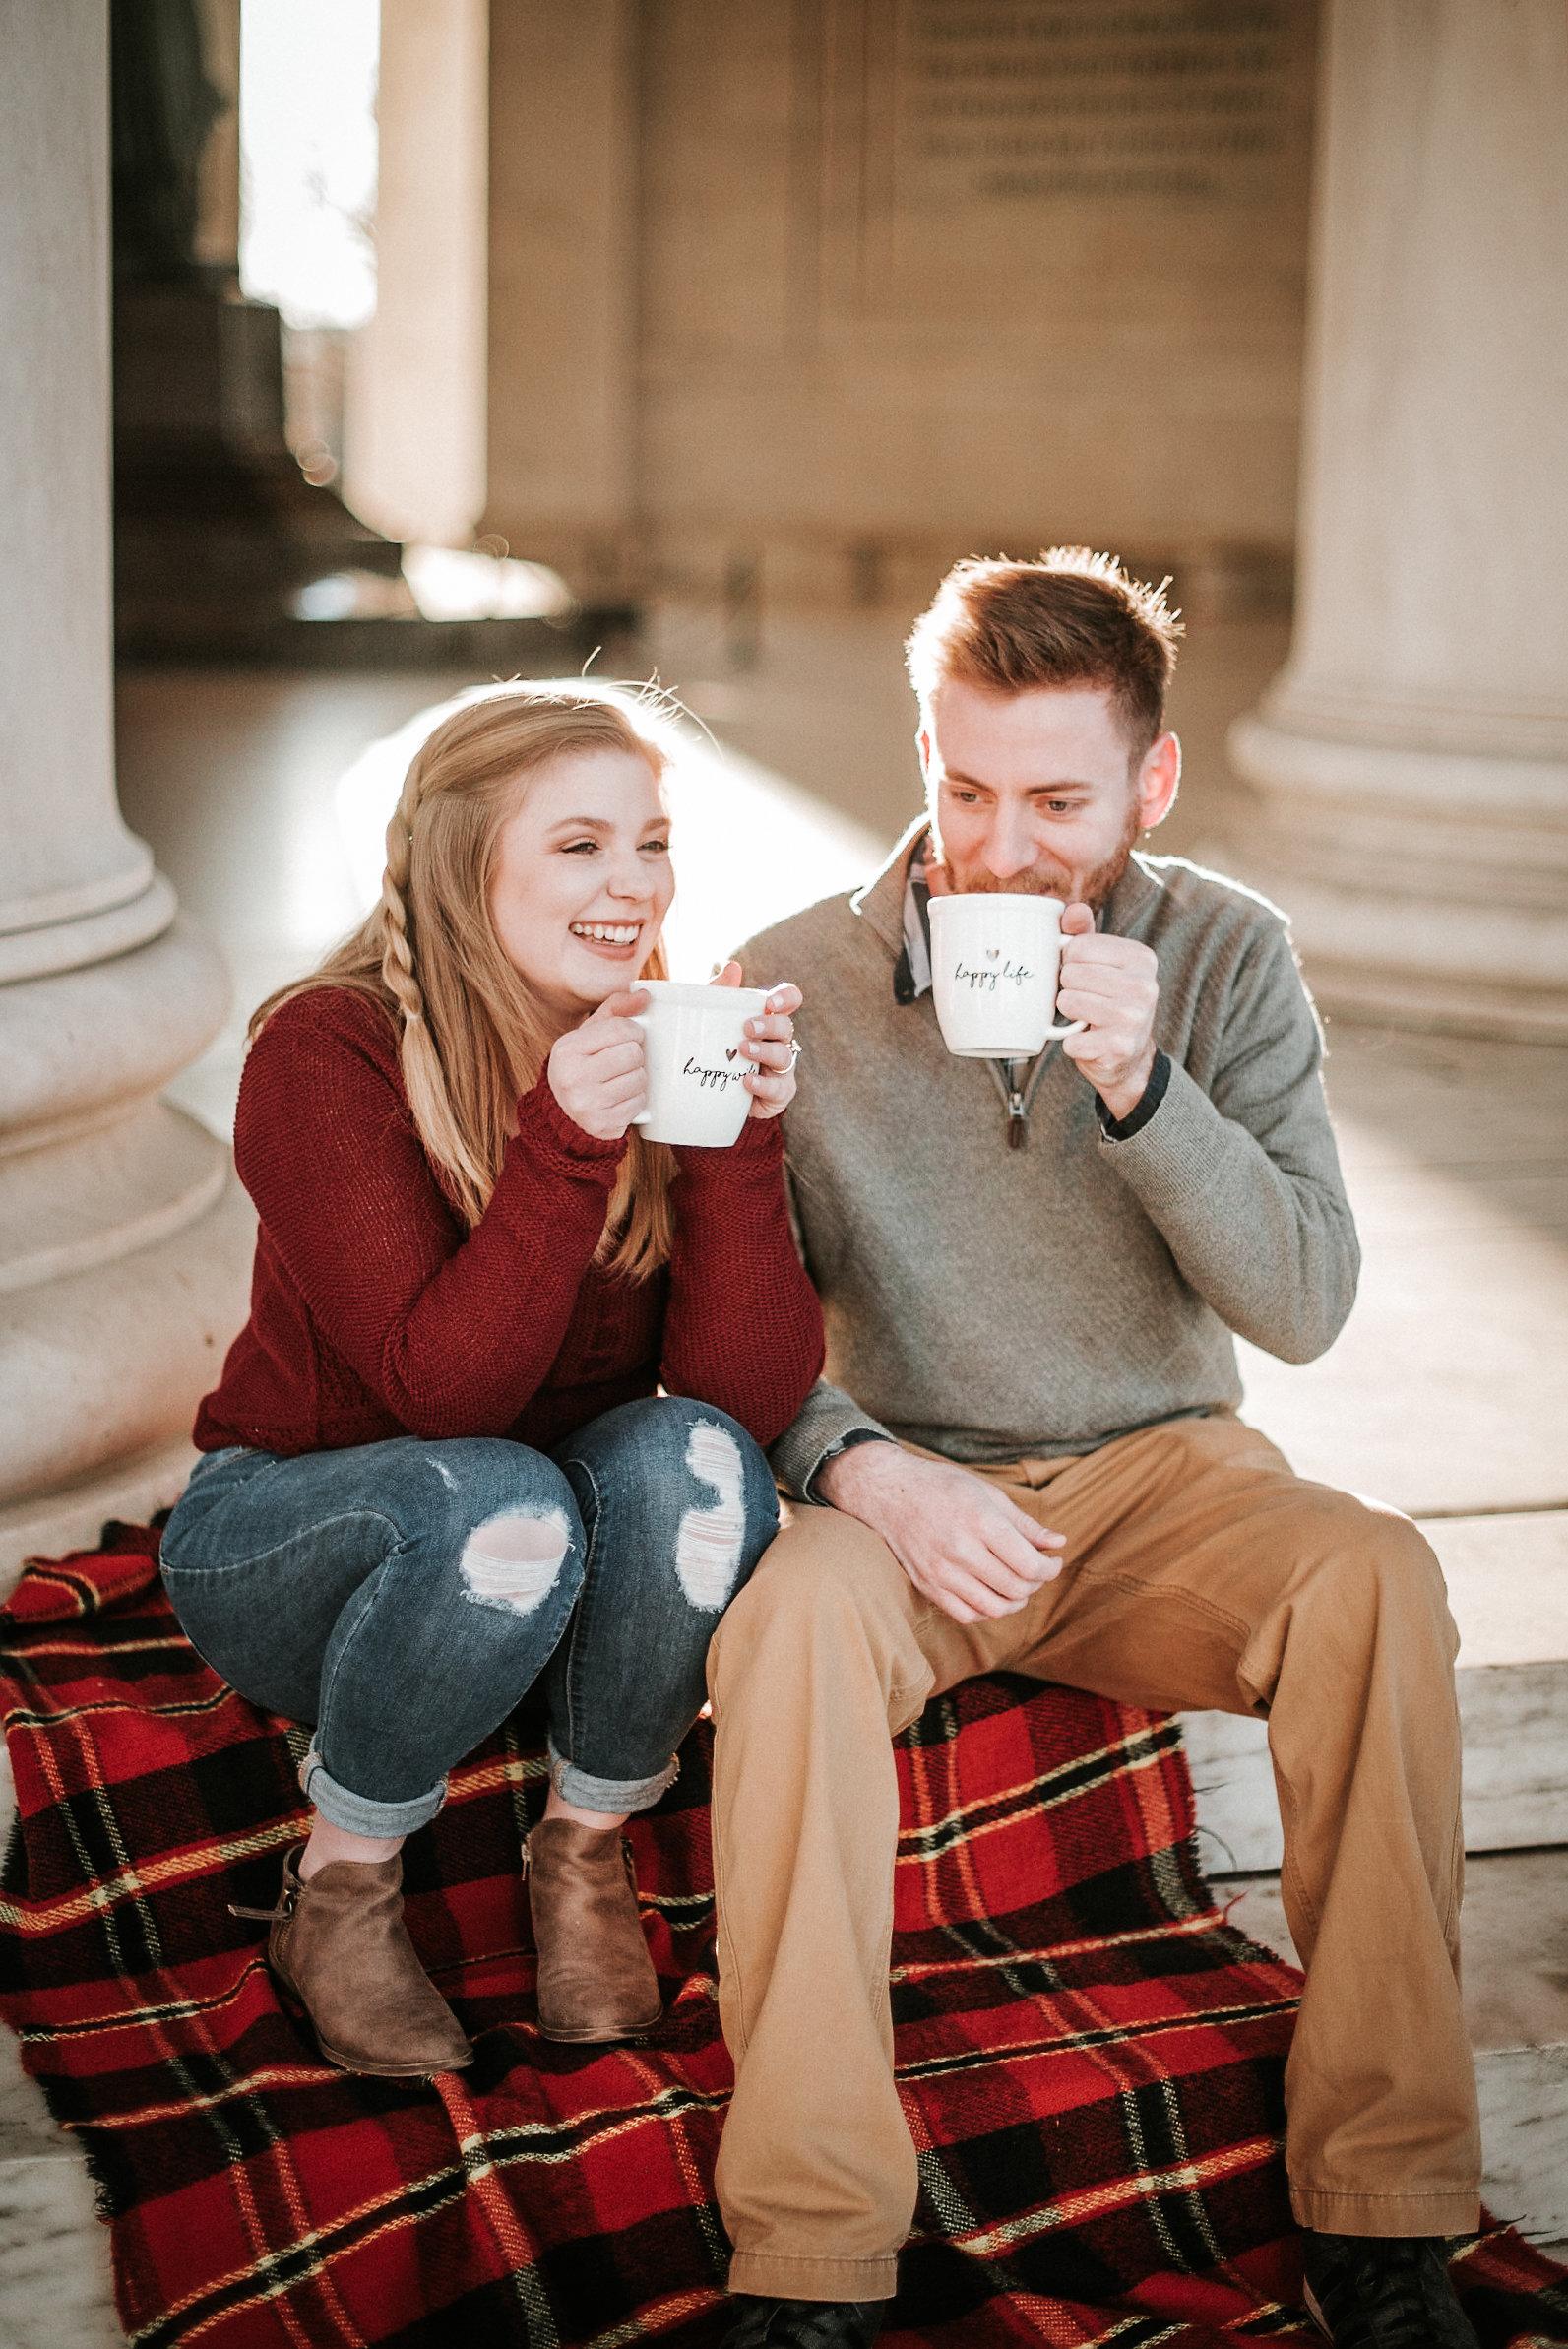 Couple sitting on blanket with mugs